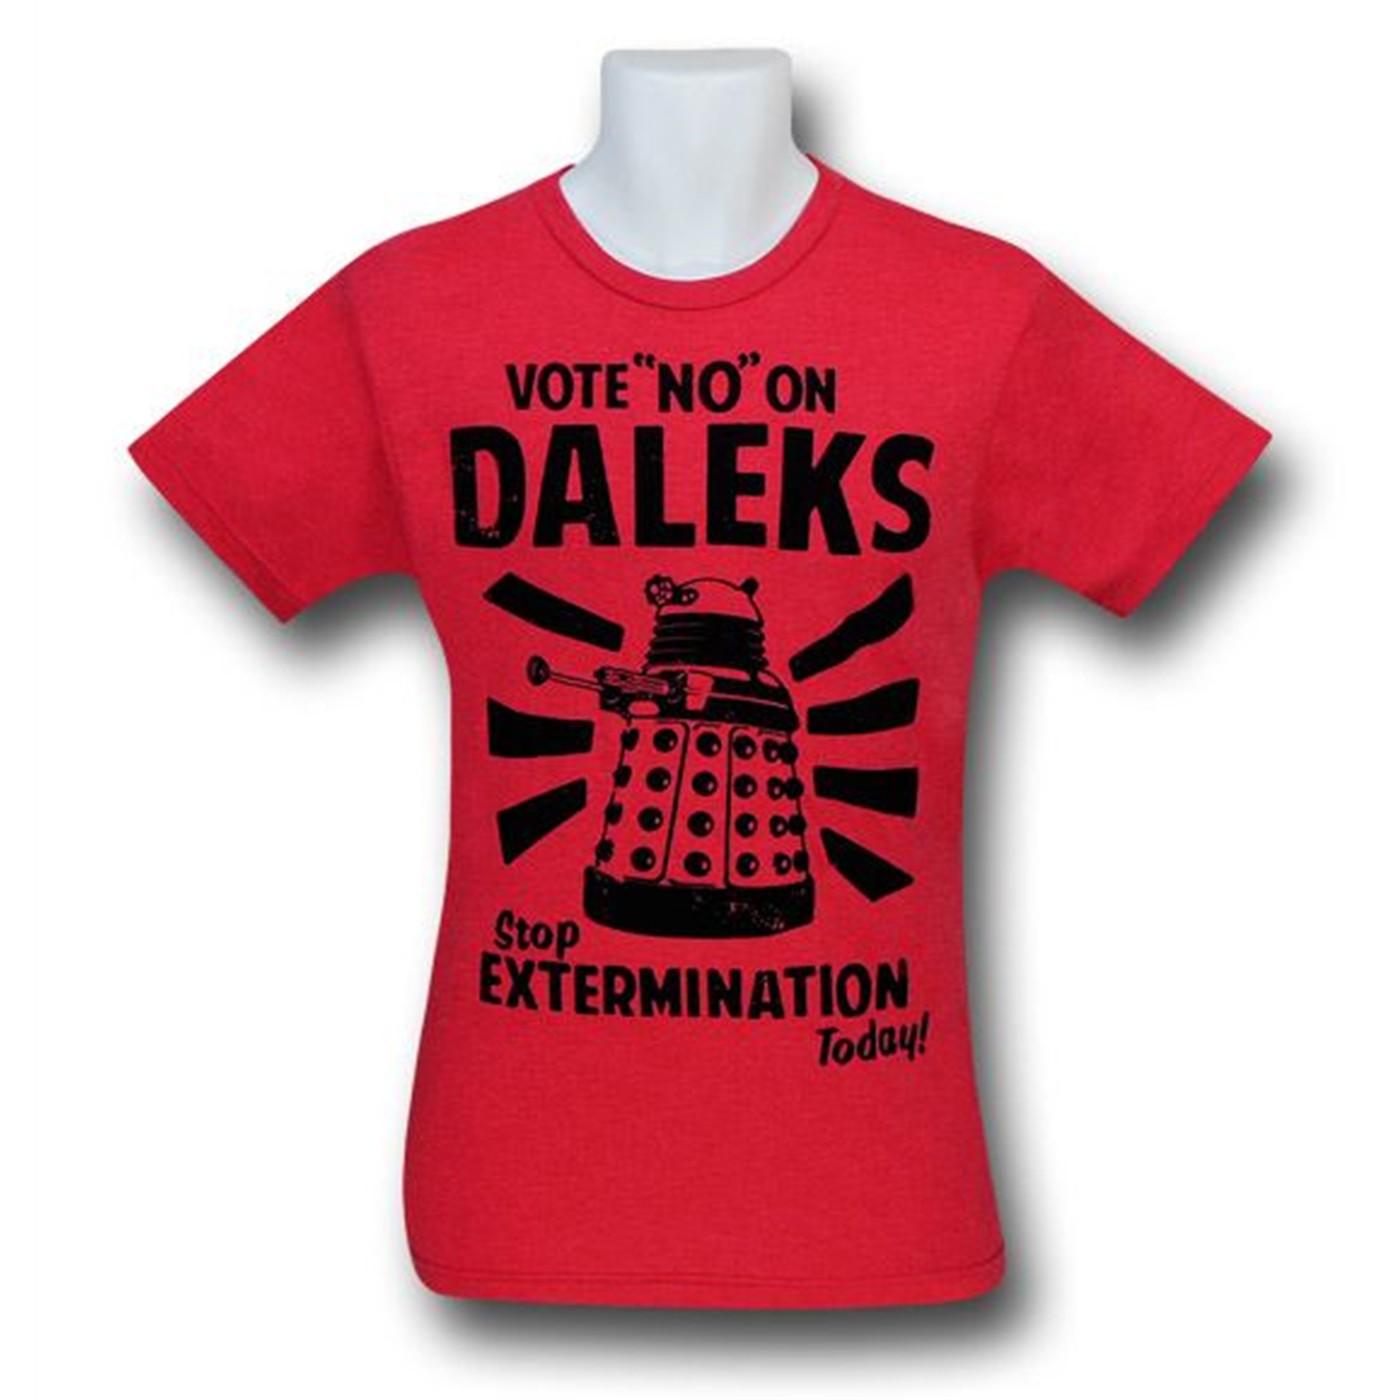 Doctor Who Daleks Vote 30 Single T-Shirt